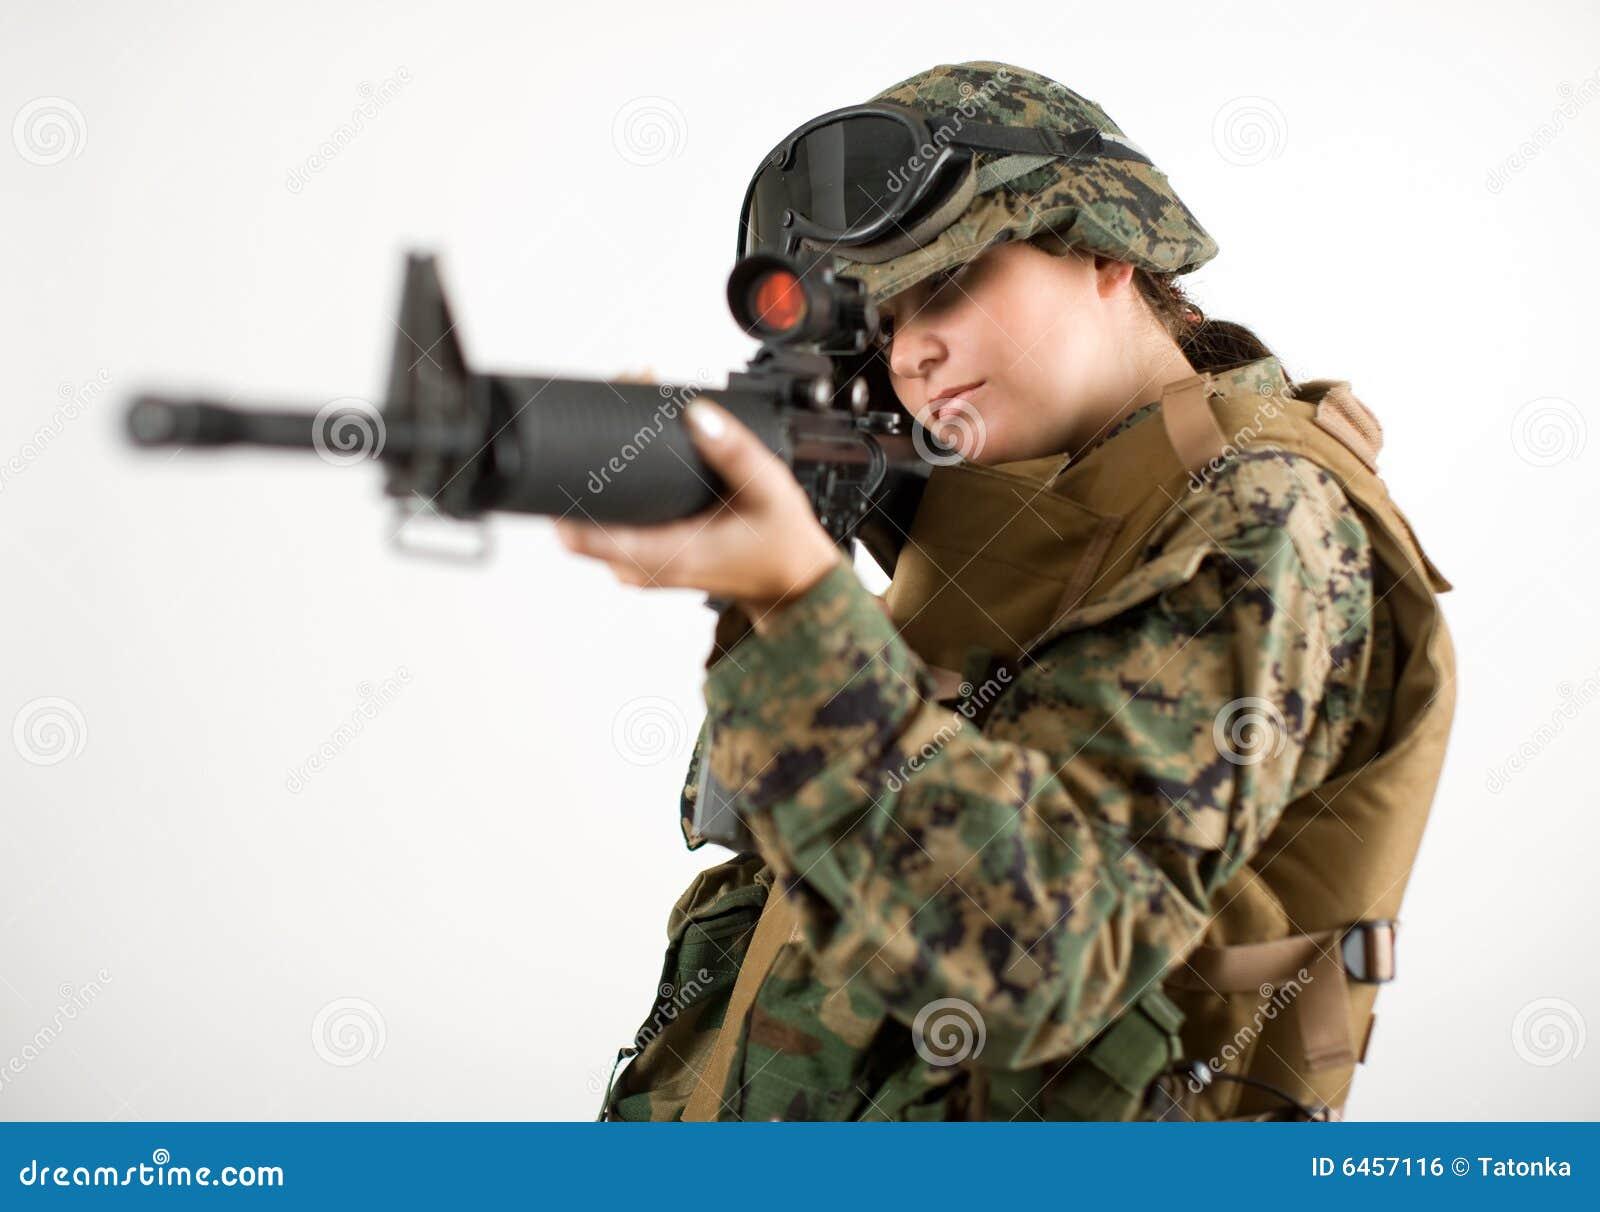 girl in military uniform